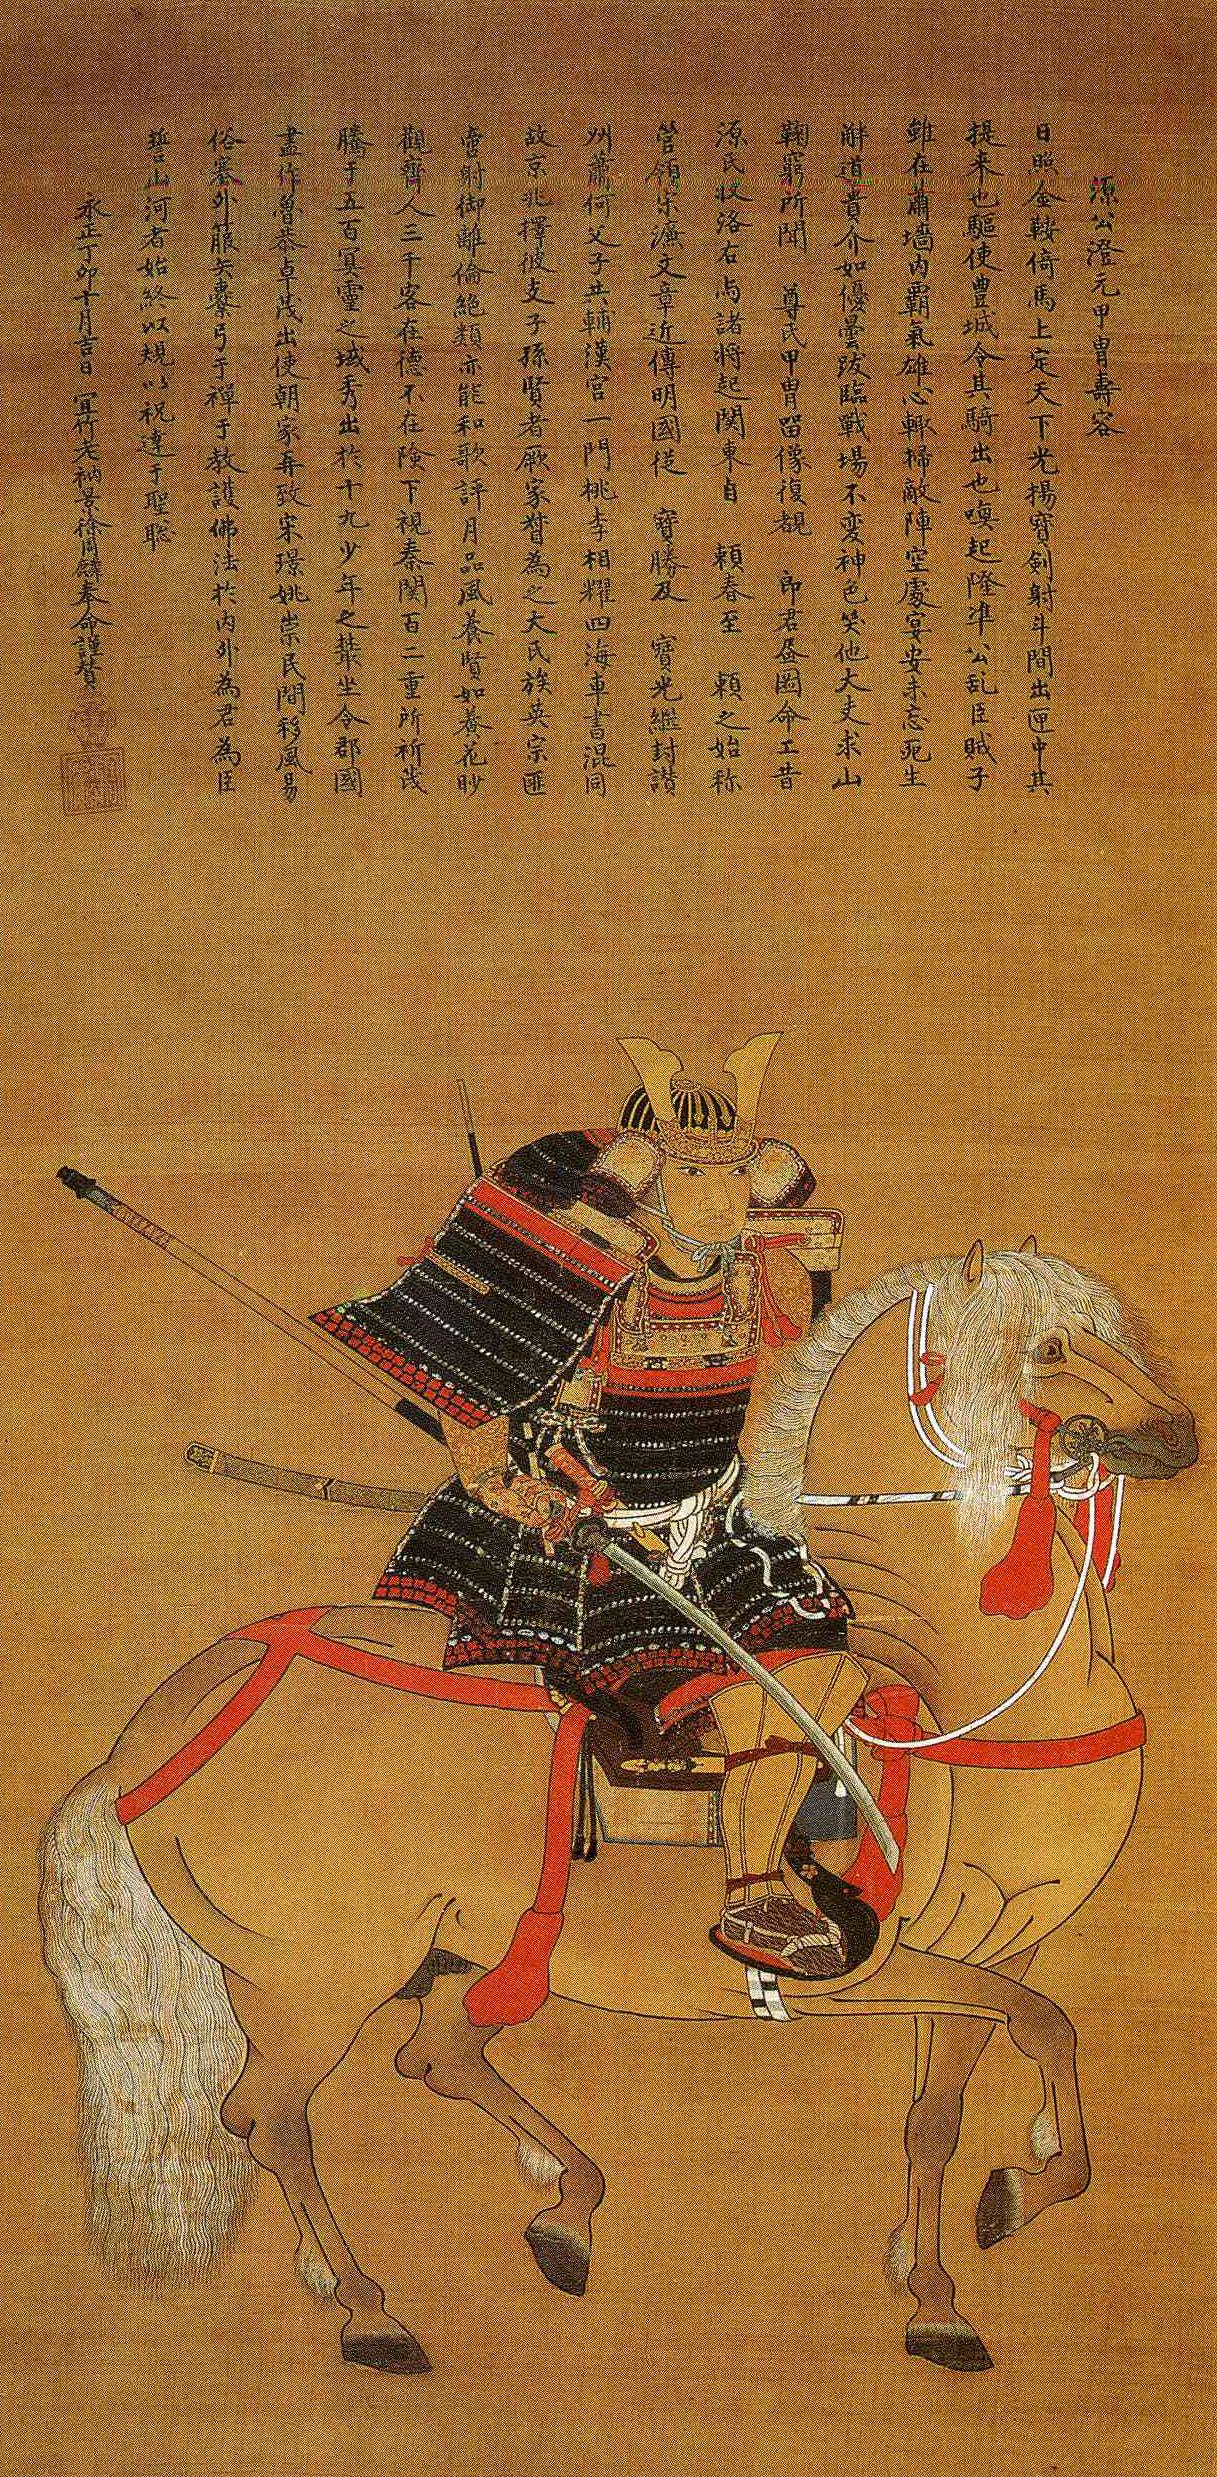 https://upload.wikimedia.org/wikipedia/commons/f/f1/Hosokawa_Sumimoto.jpg